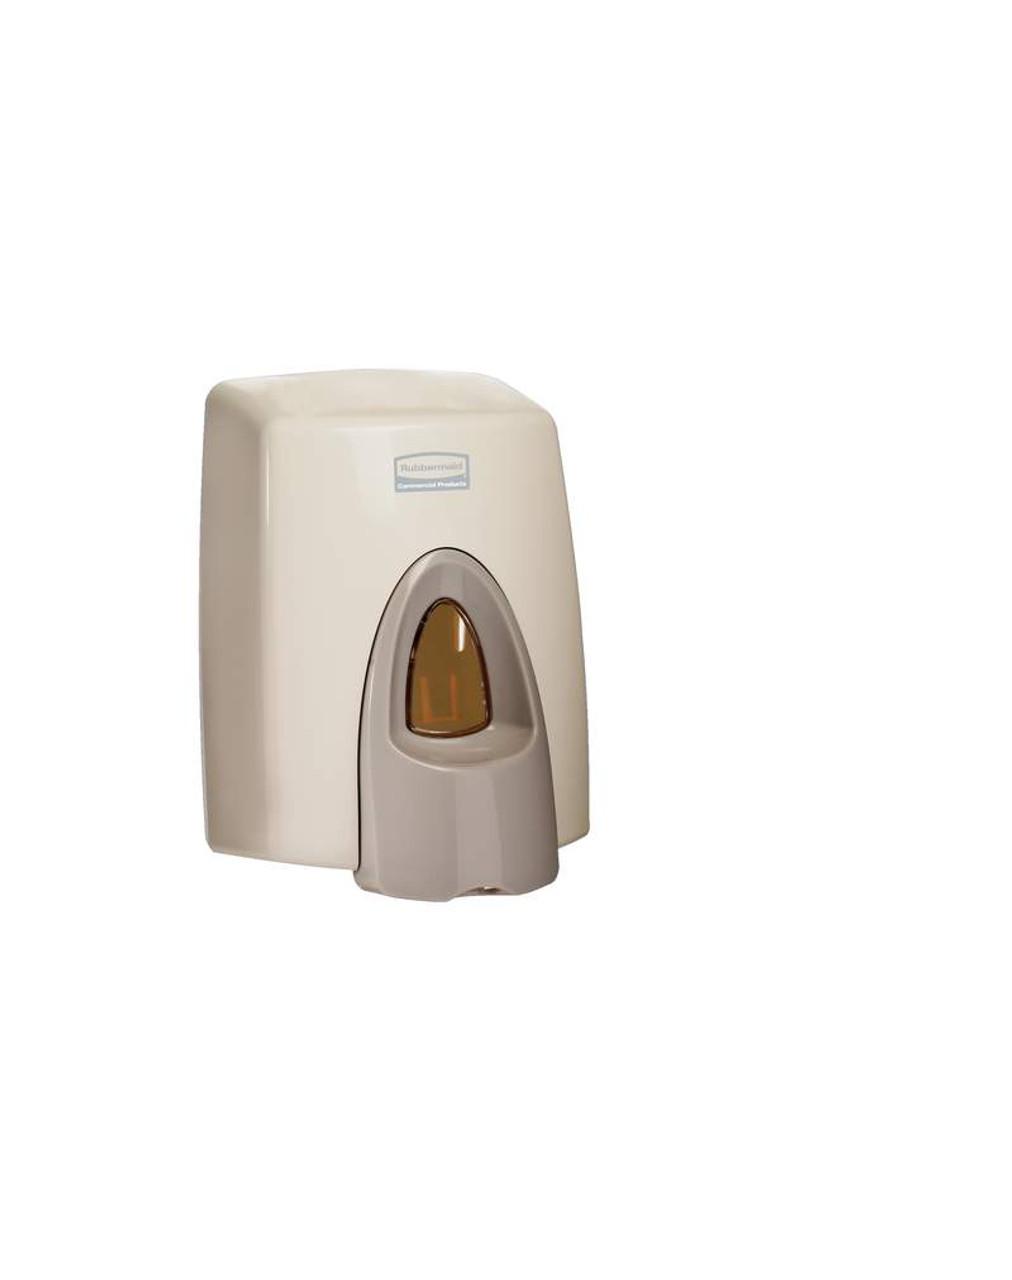 Rubbermaid 400ml Rubbermaid Foam Seat & Handle Cleaner Dispenser - White - 1855204